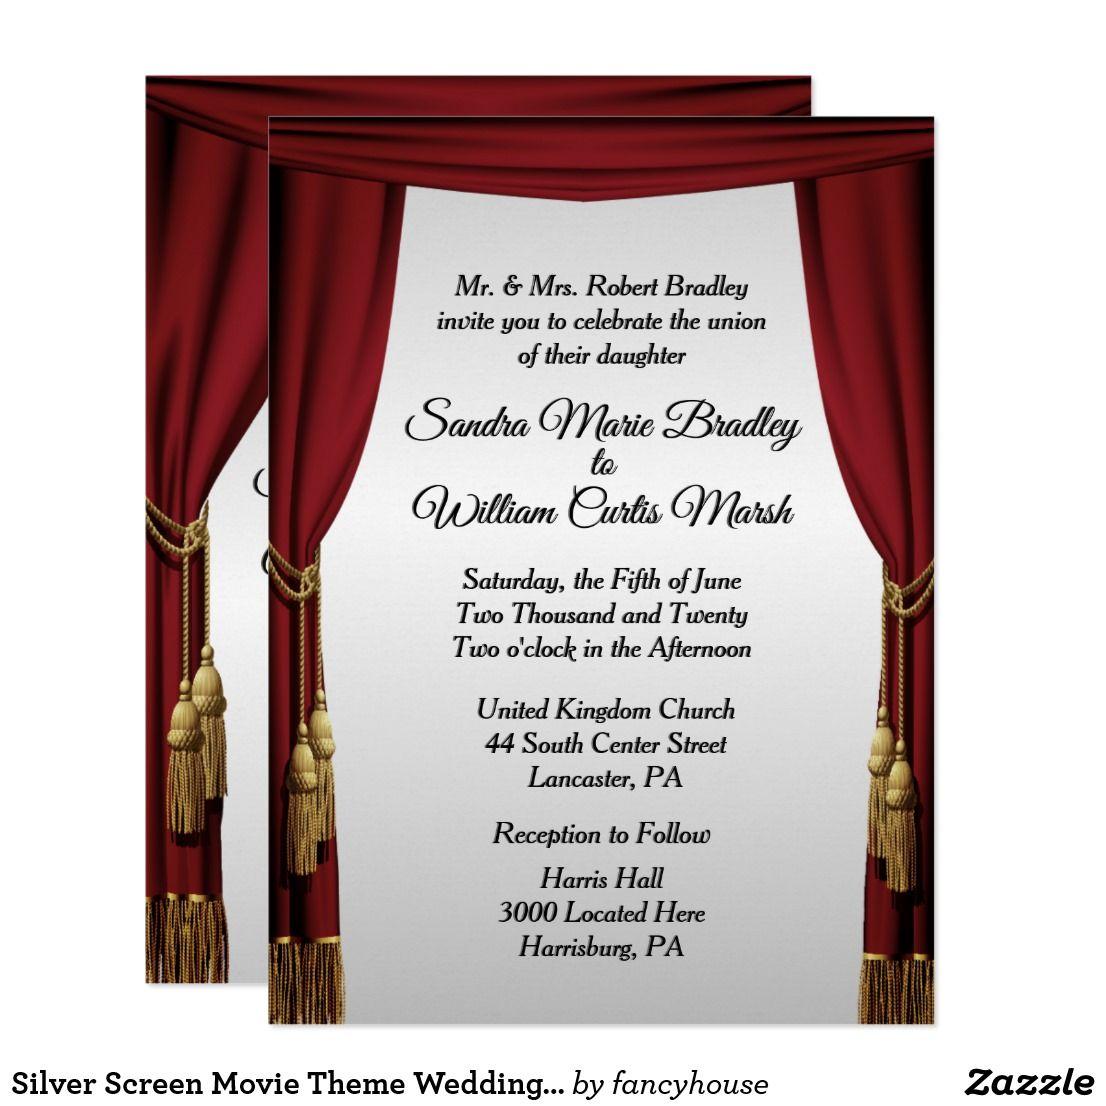 Silver Screen Movie Theme Wedding Invitation | Movie theme weddings